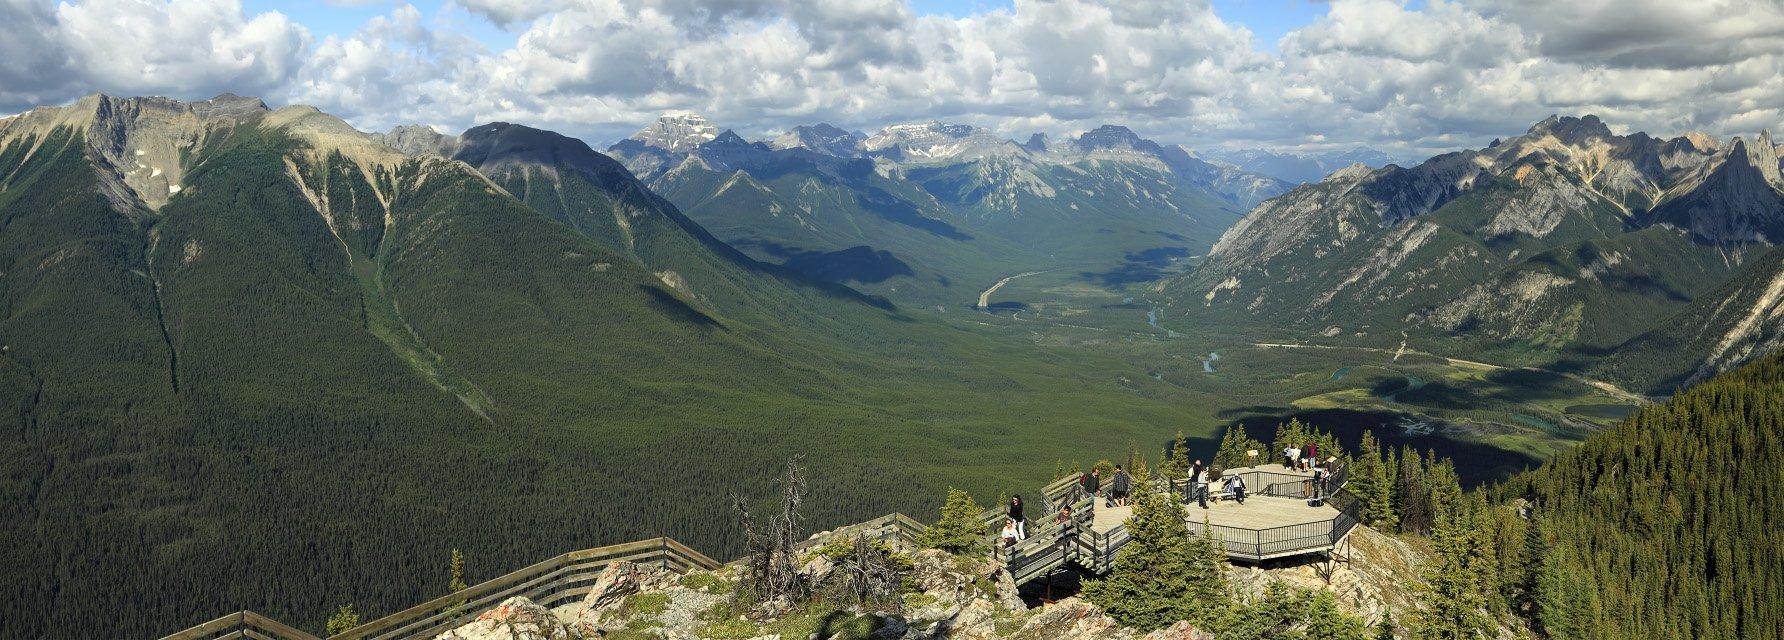 скалистые горы, лес, банф, канада, Наталия Протасова